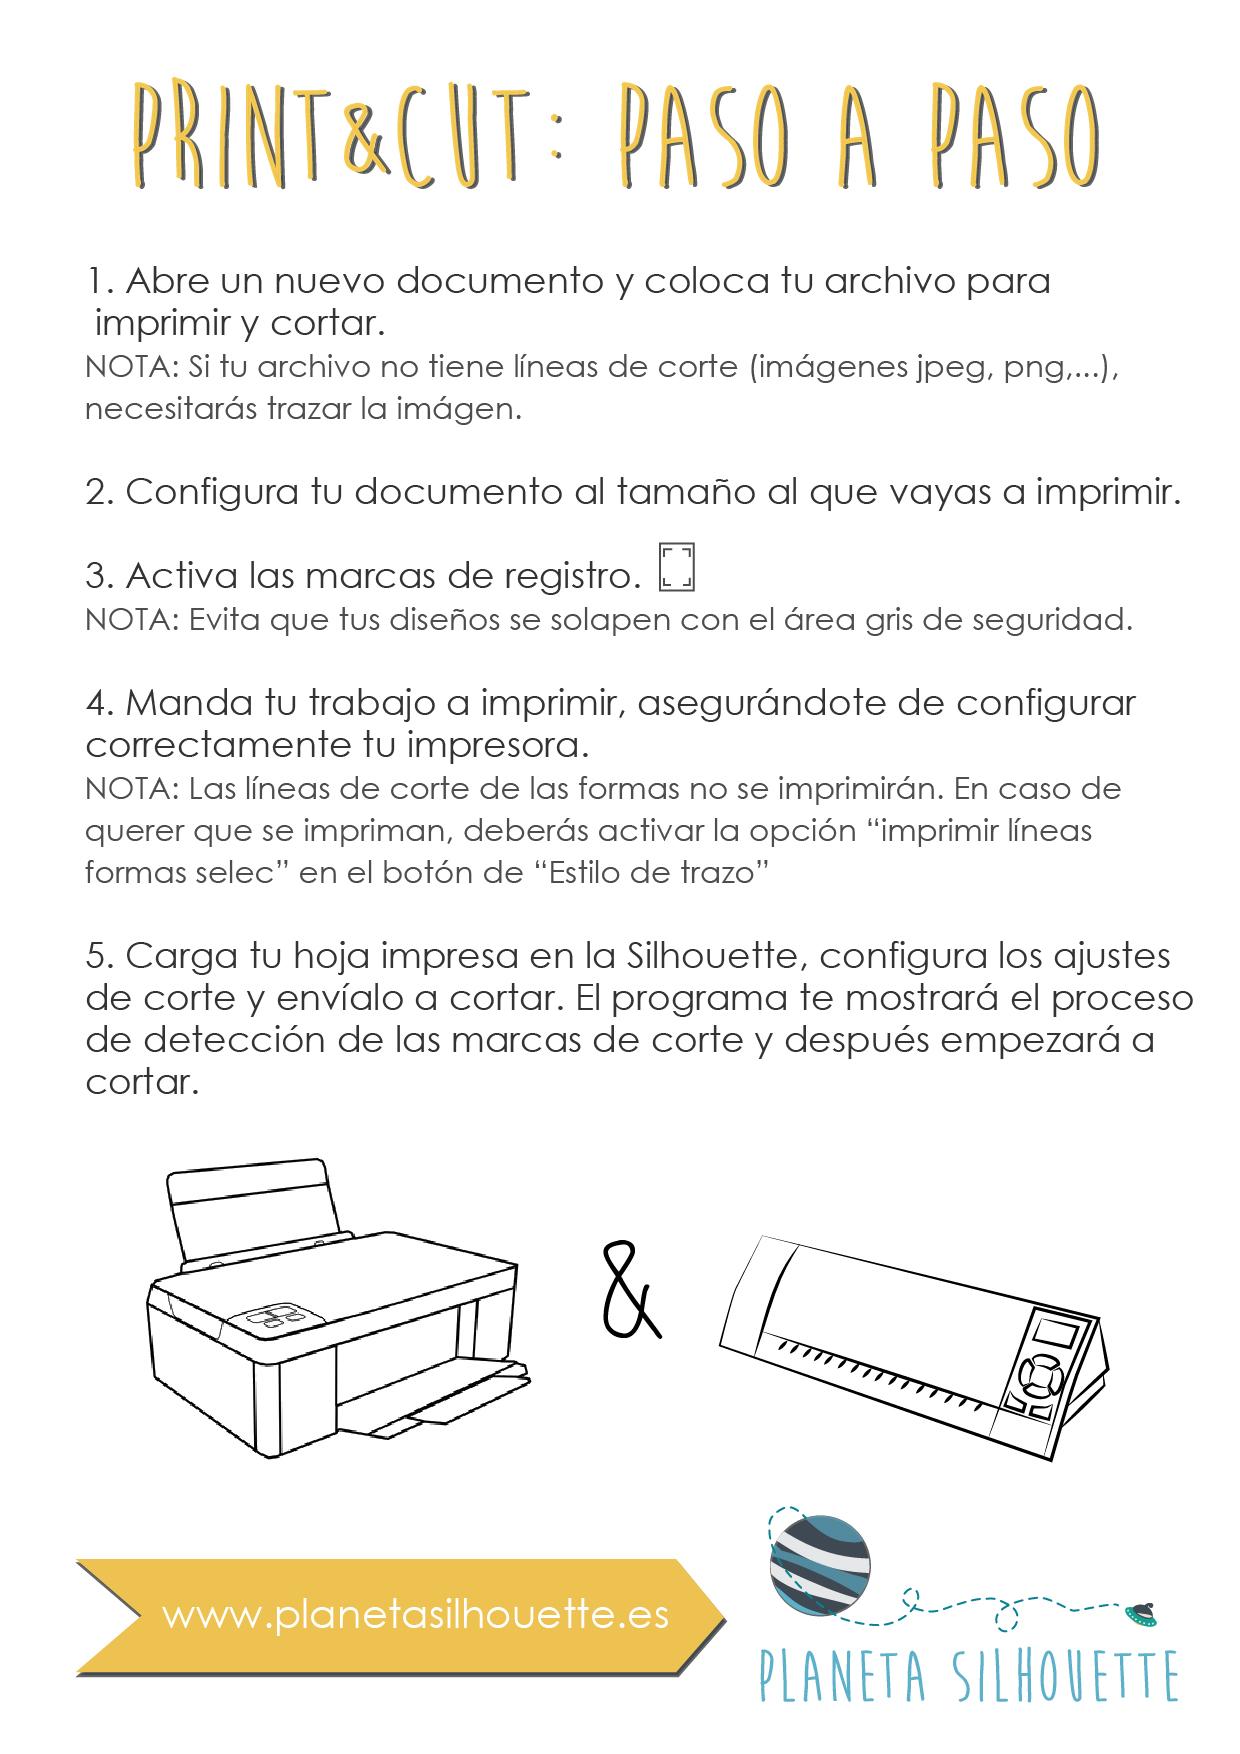 Imprimir y Cortar con tu Silhouette   Planeta Silhouette